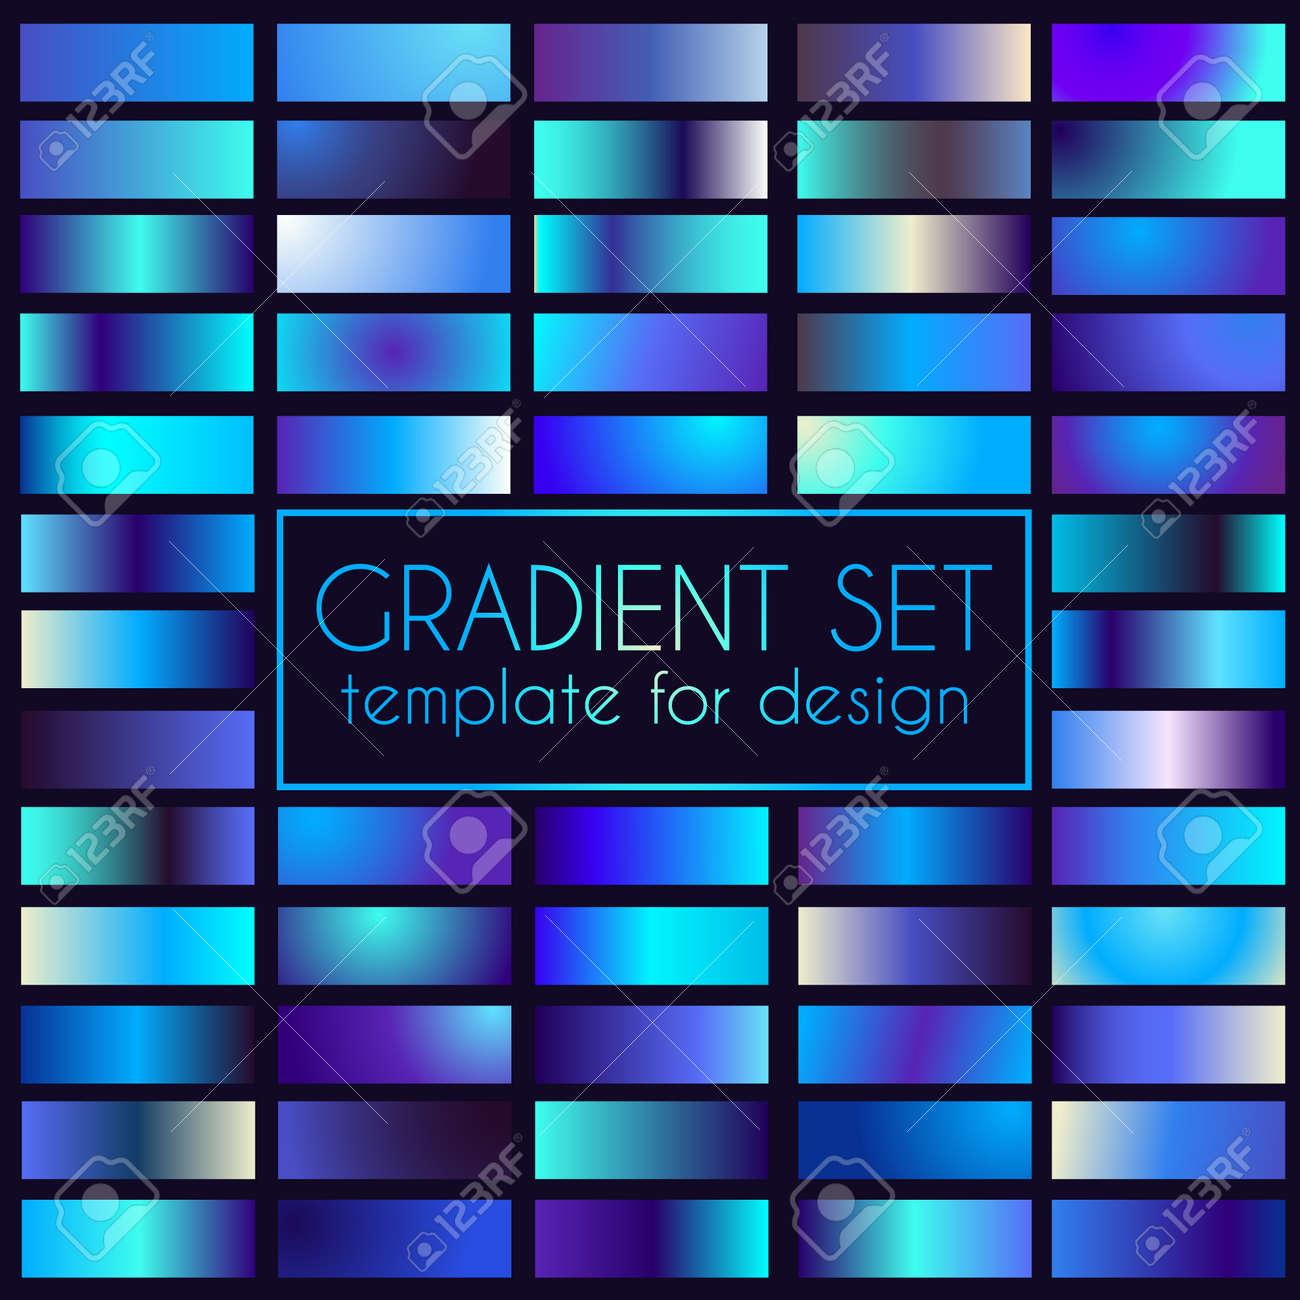 Multicolored bright gradient set. Template for design - 105101147